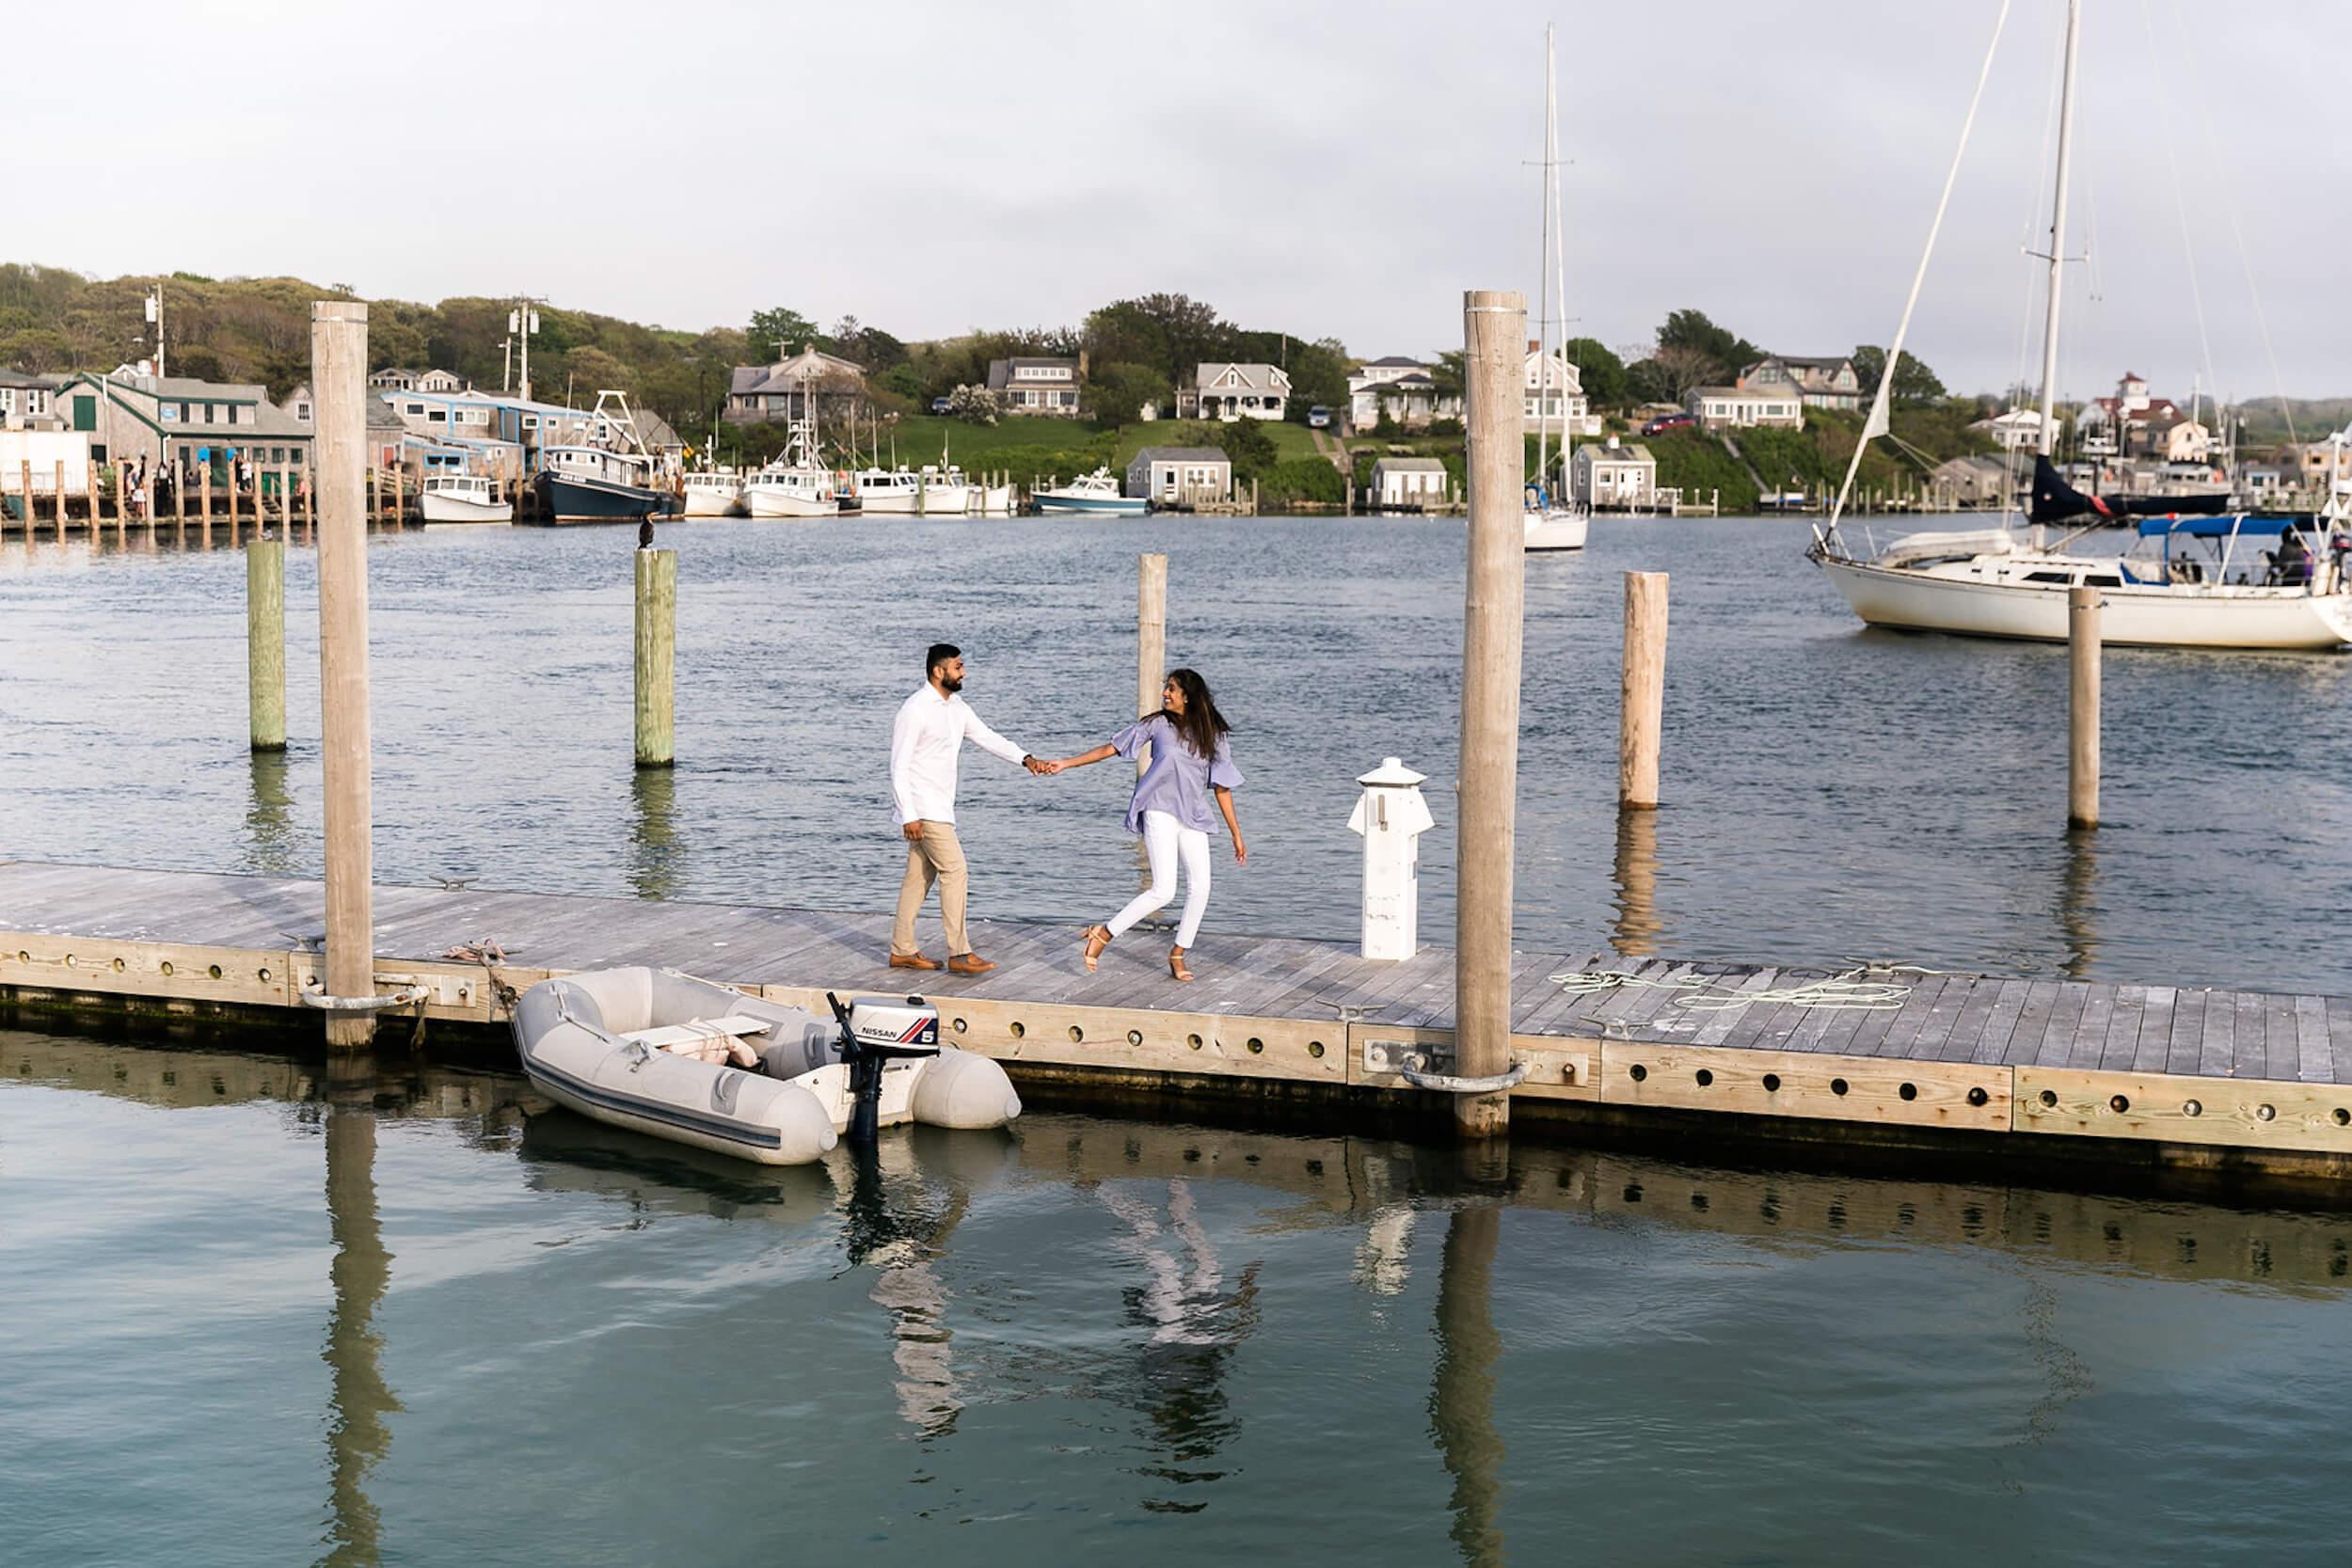 A couple walks along a dock in Martha's Vineyard, Massachusetts, USA.